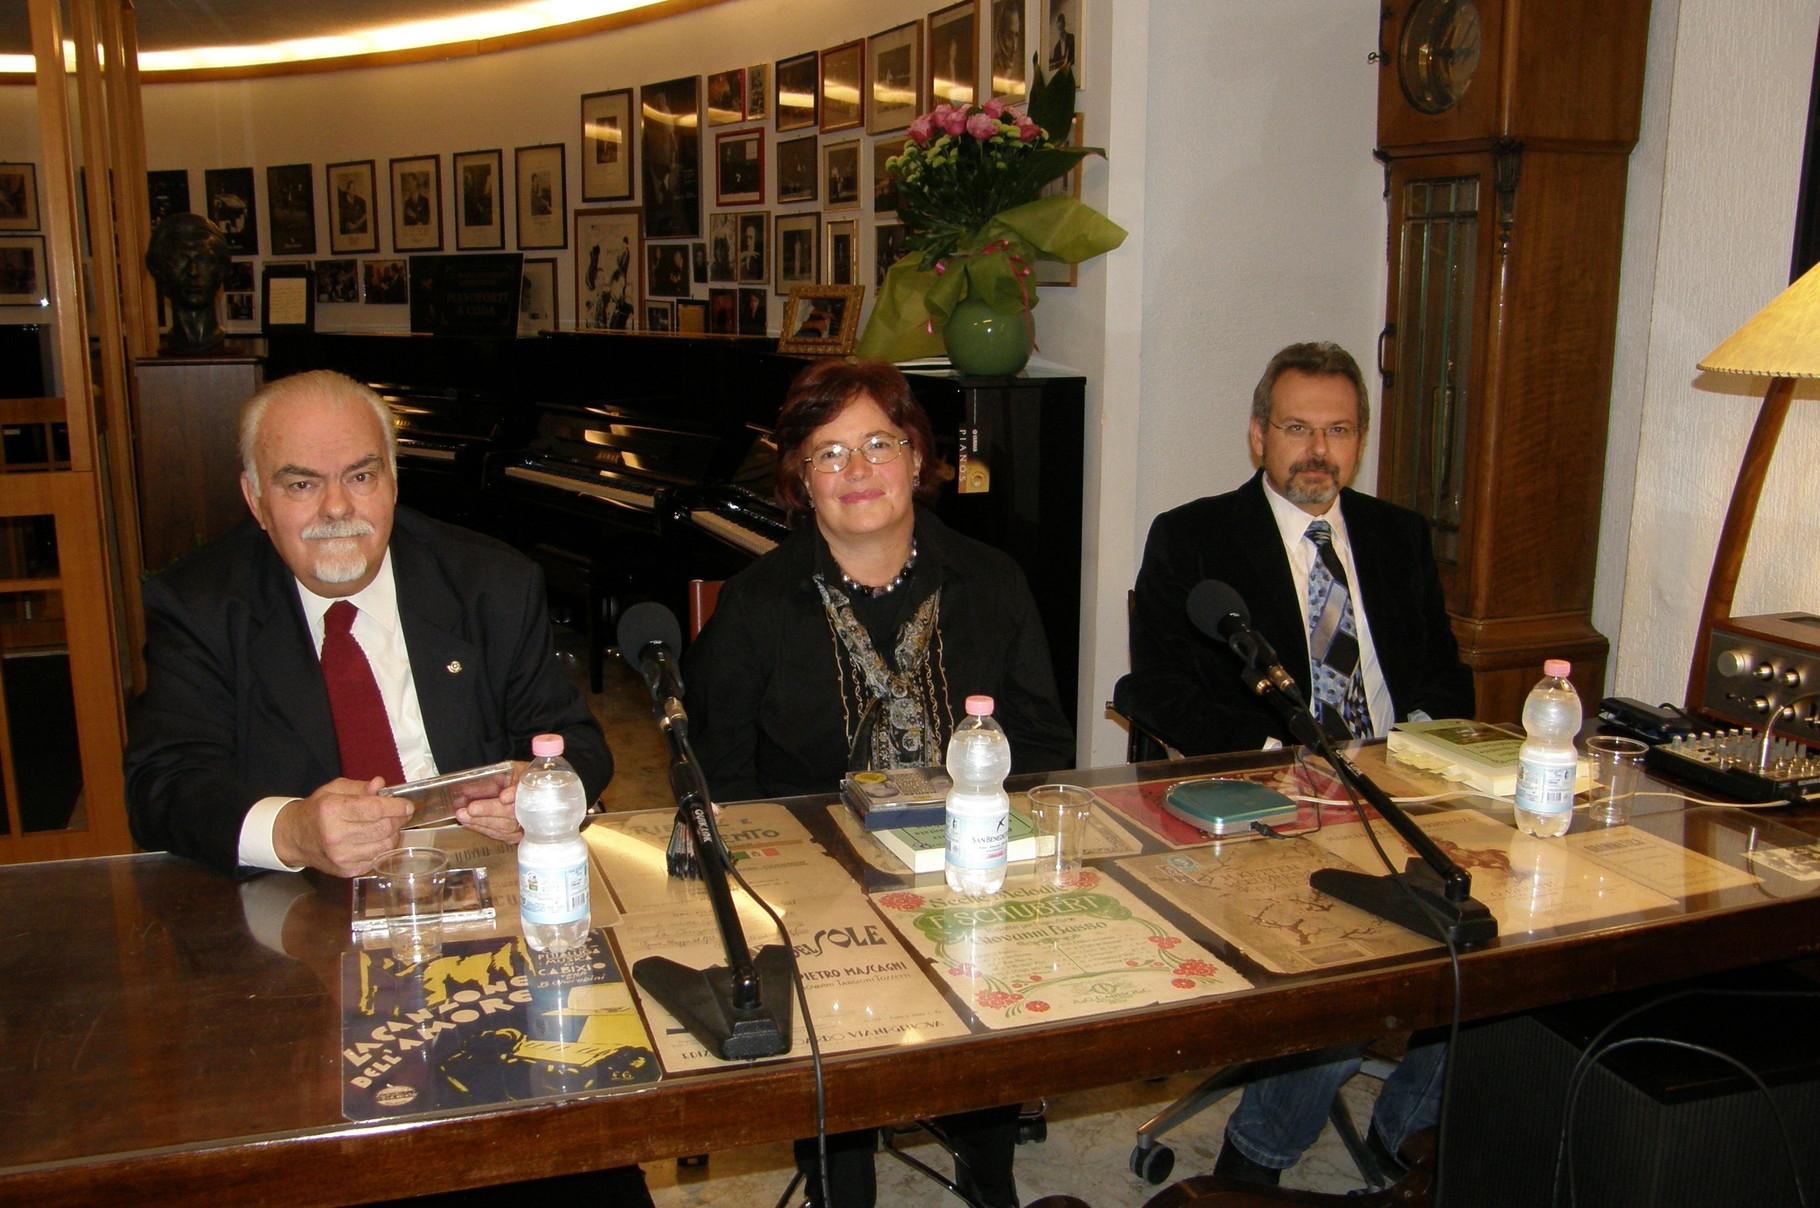 Con N.Sbisà e G.Ciliberti. Bari, Casa Giannini